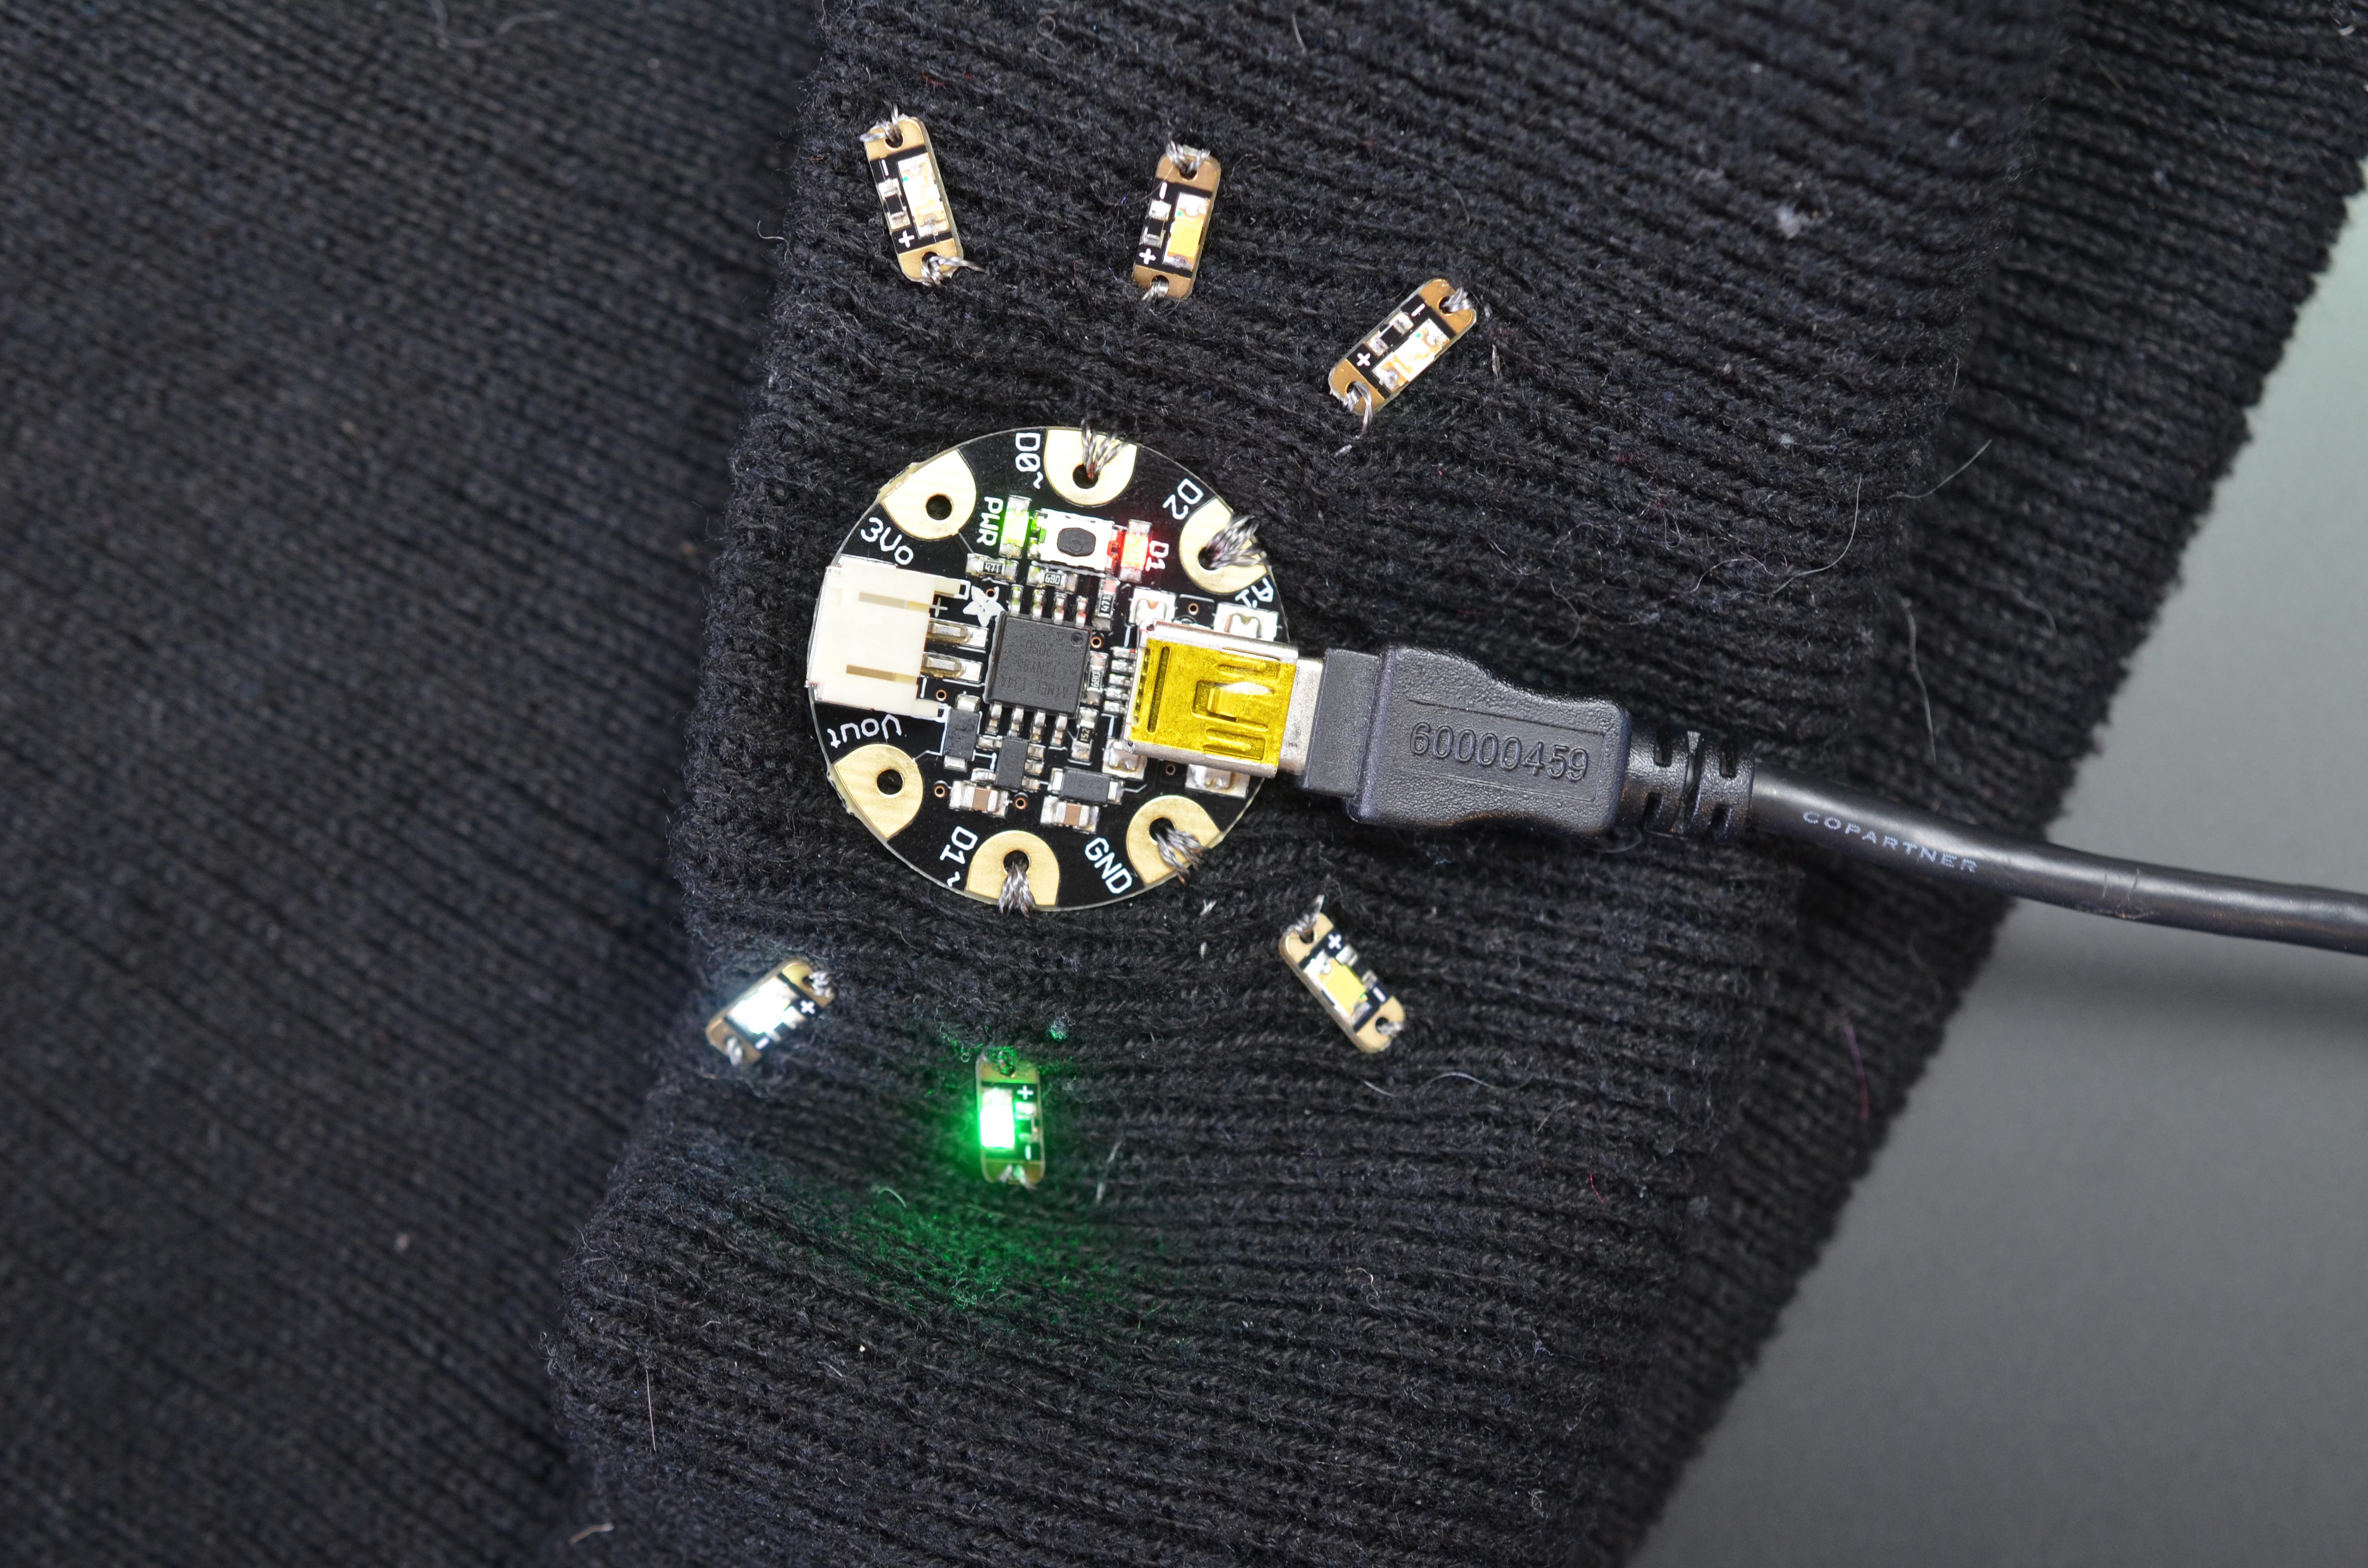 leds_adafruit-led-sequins-hat-10.jpg